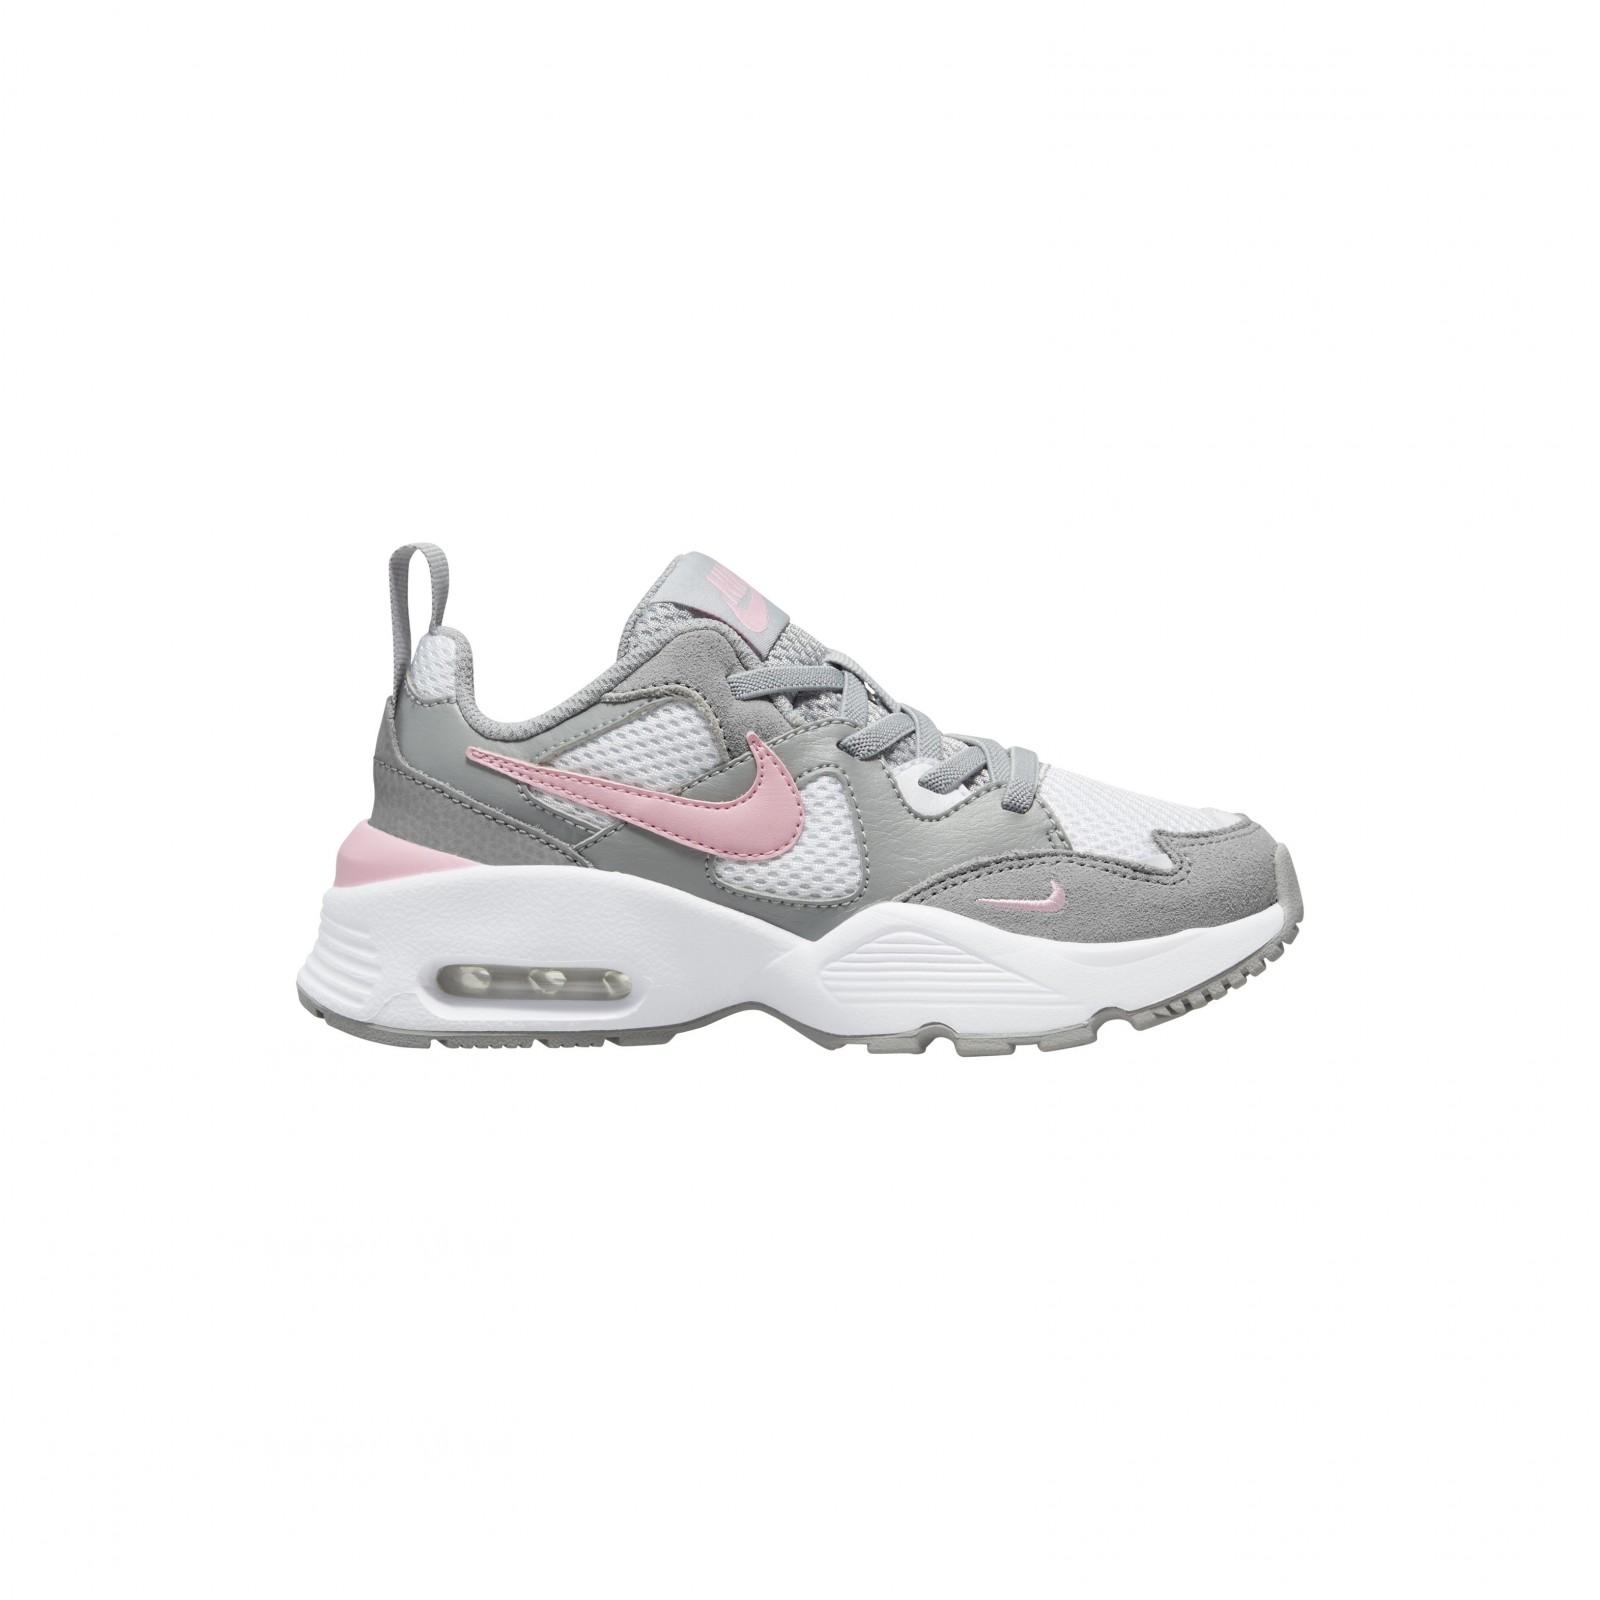 Nike air max fusion (ps) LT SMOKE GREY/PINK-WHITE